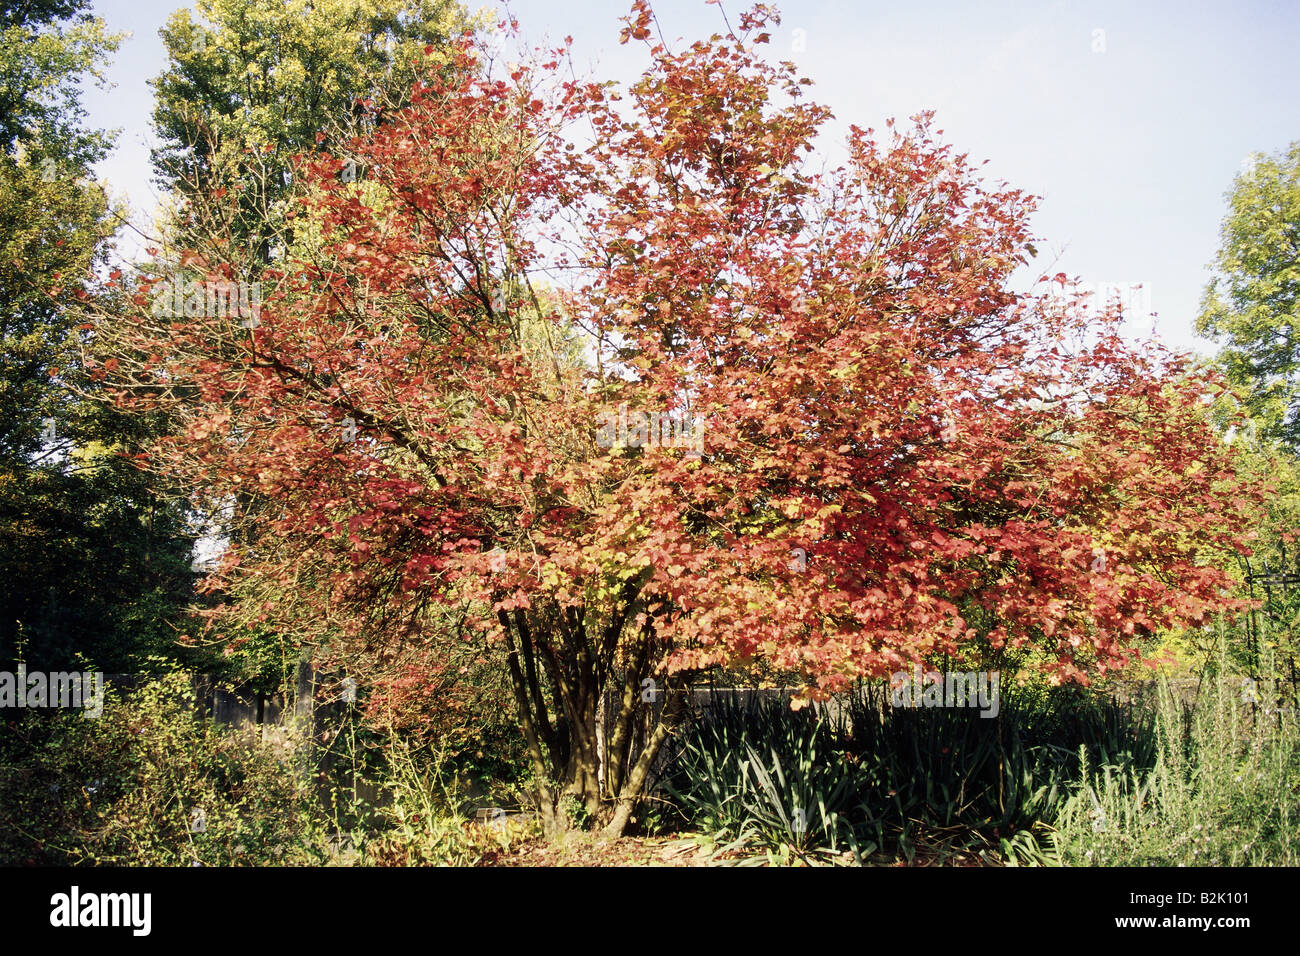 botany, Viburnum, Wayfaring Tree, (Viburnum lantana),  Asteridae, Dipsacales, Adoxaceae, caprifoliaceae, Additional - Stock Image